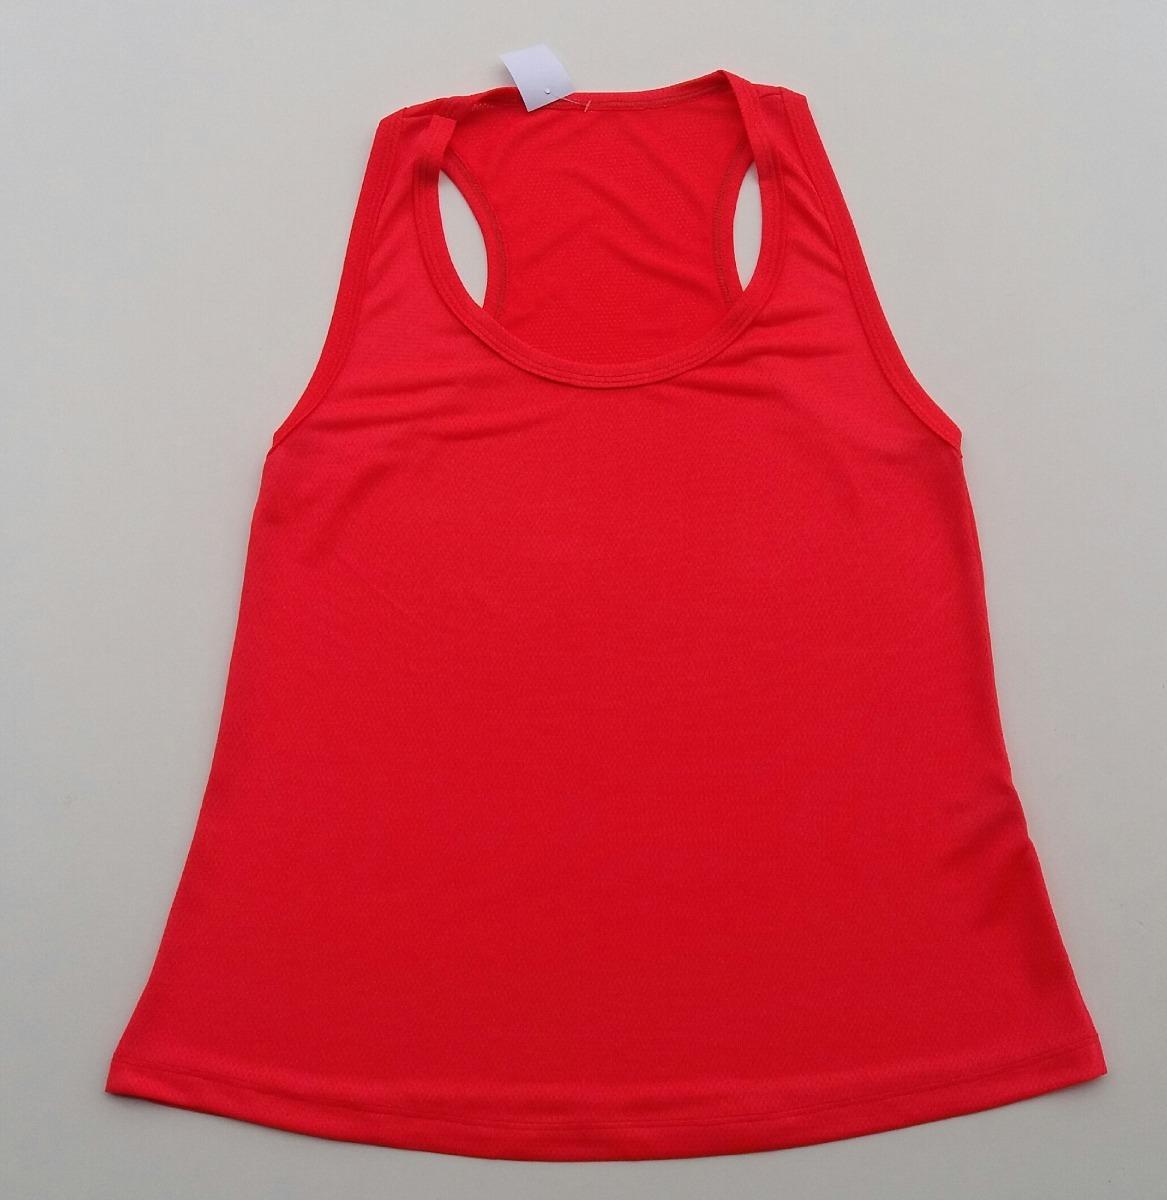 5dbf250f2c regata blusa kit 6 roupa academia feminina dryfit cor variad. Carregando  zoom.